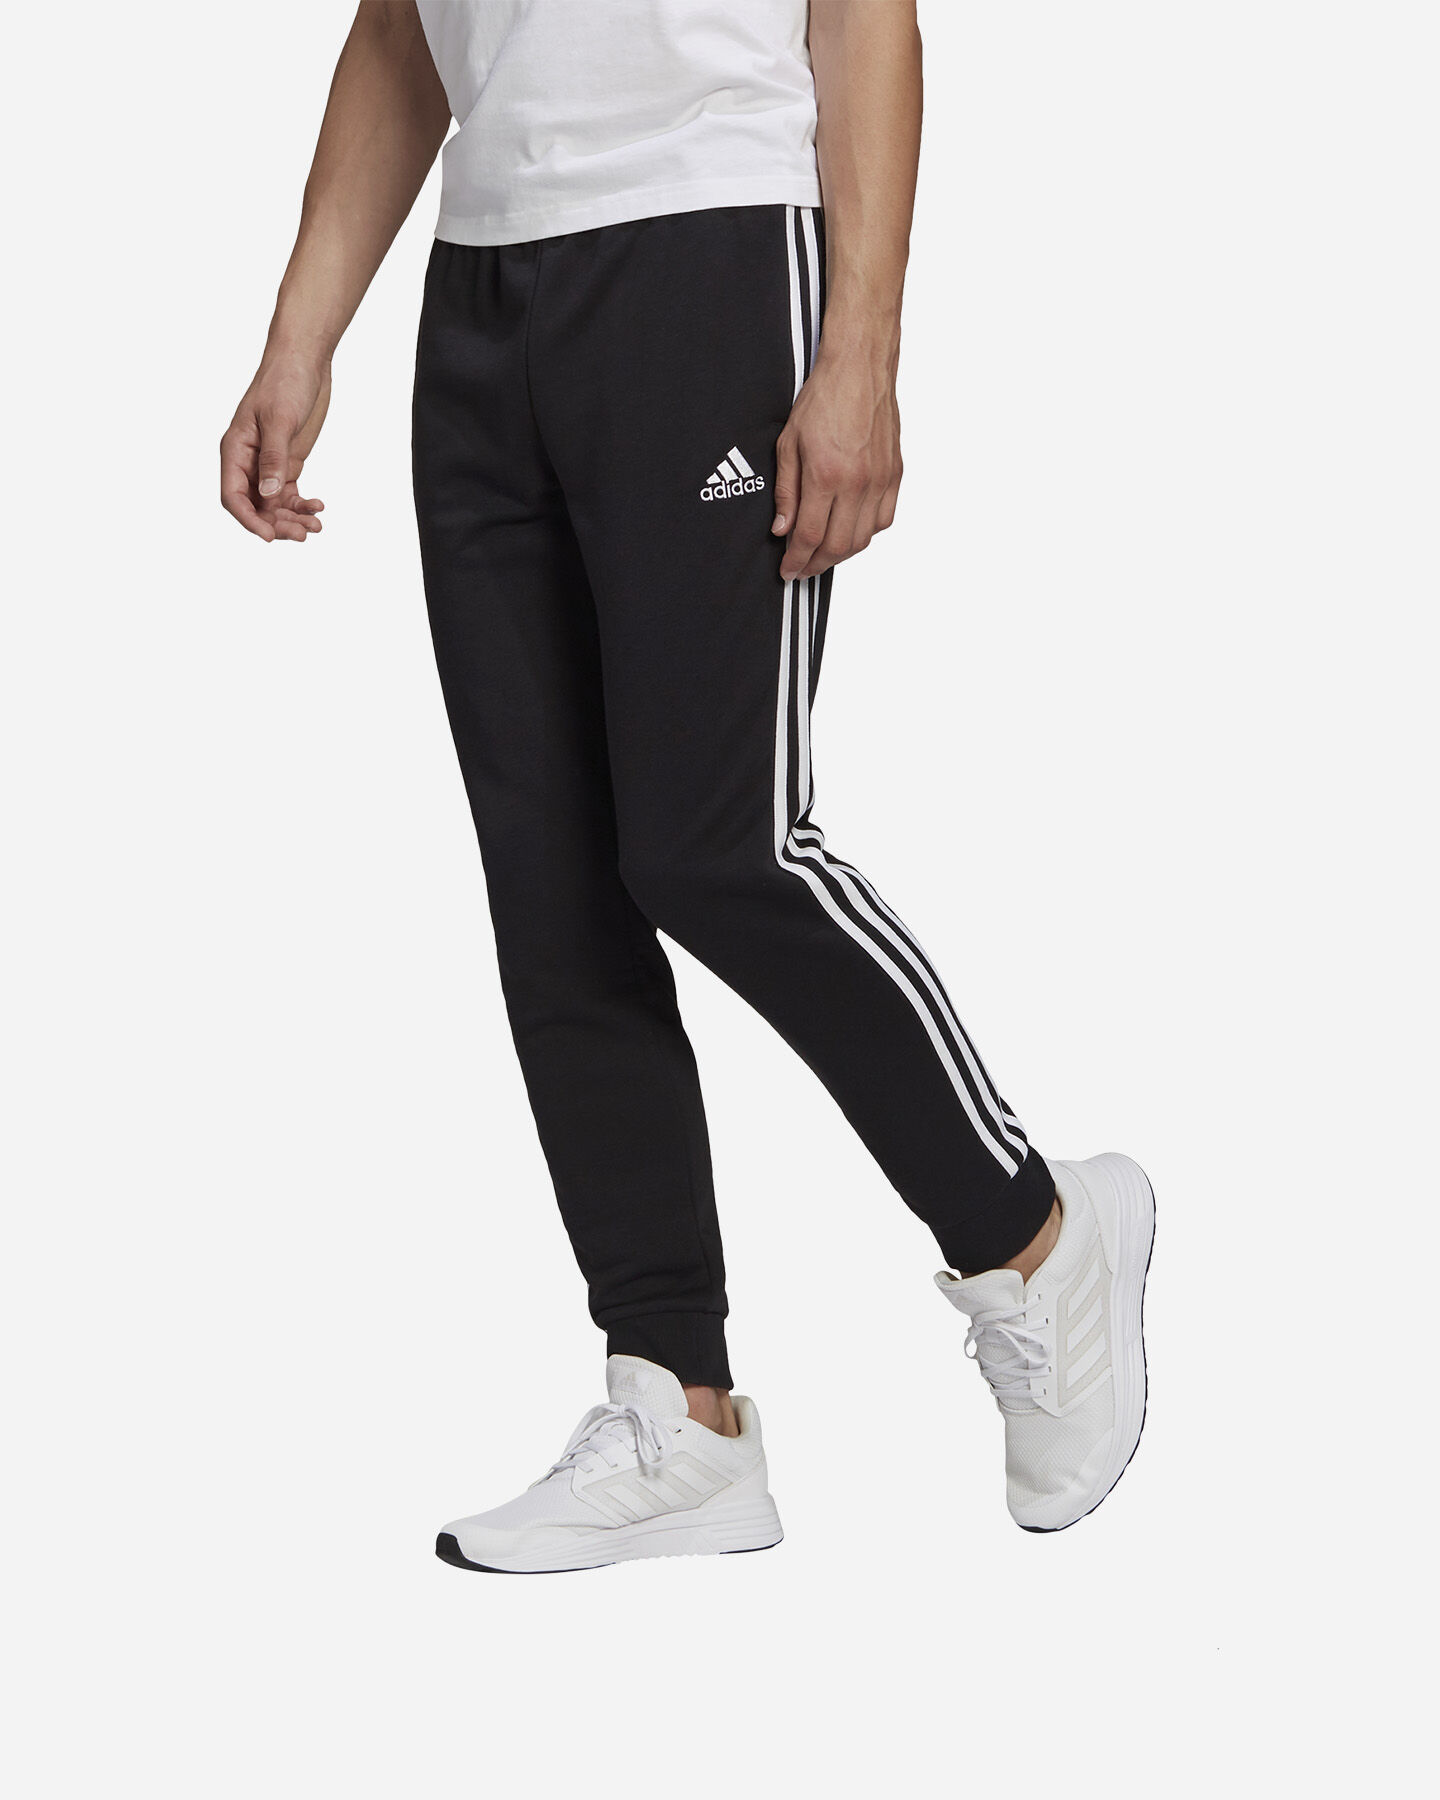 Pantalone ADIDAS FRT CORE 3S M S5274264 scatto 1